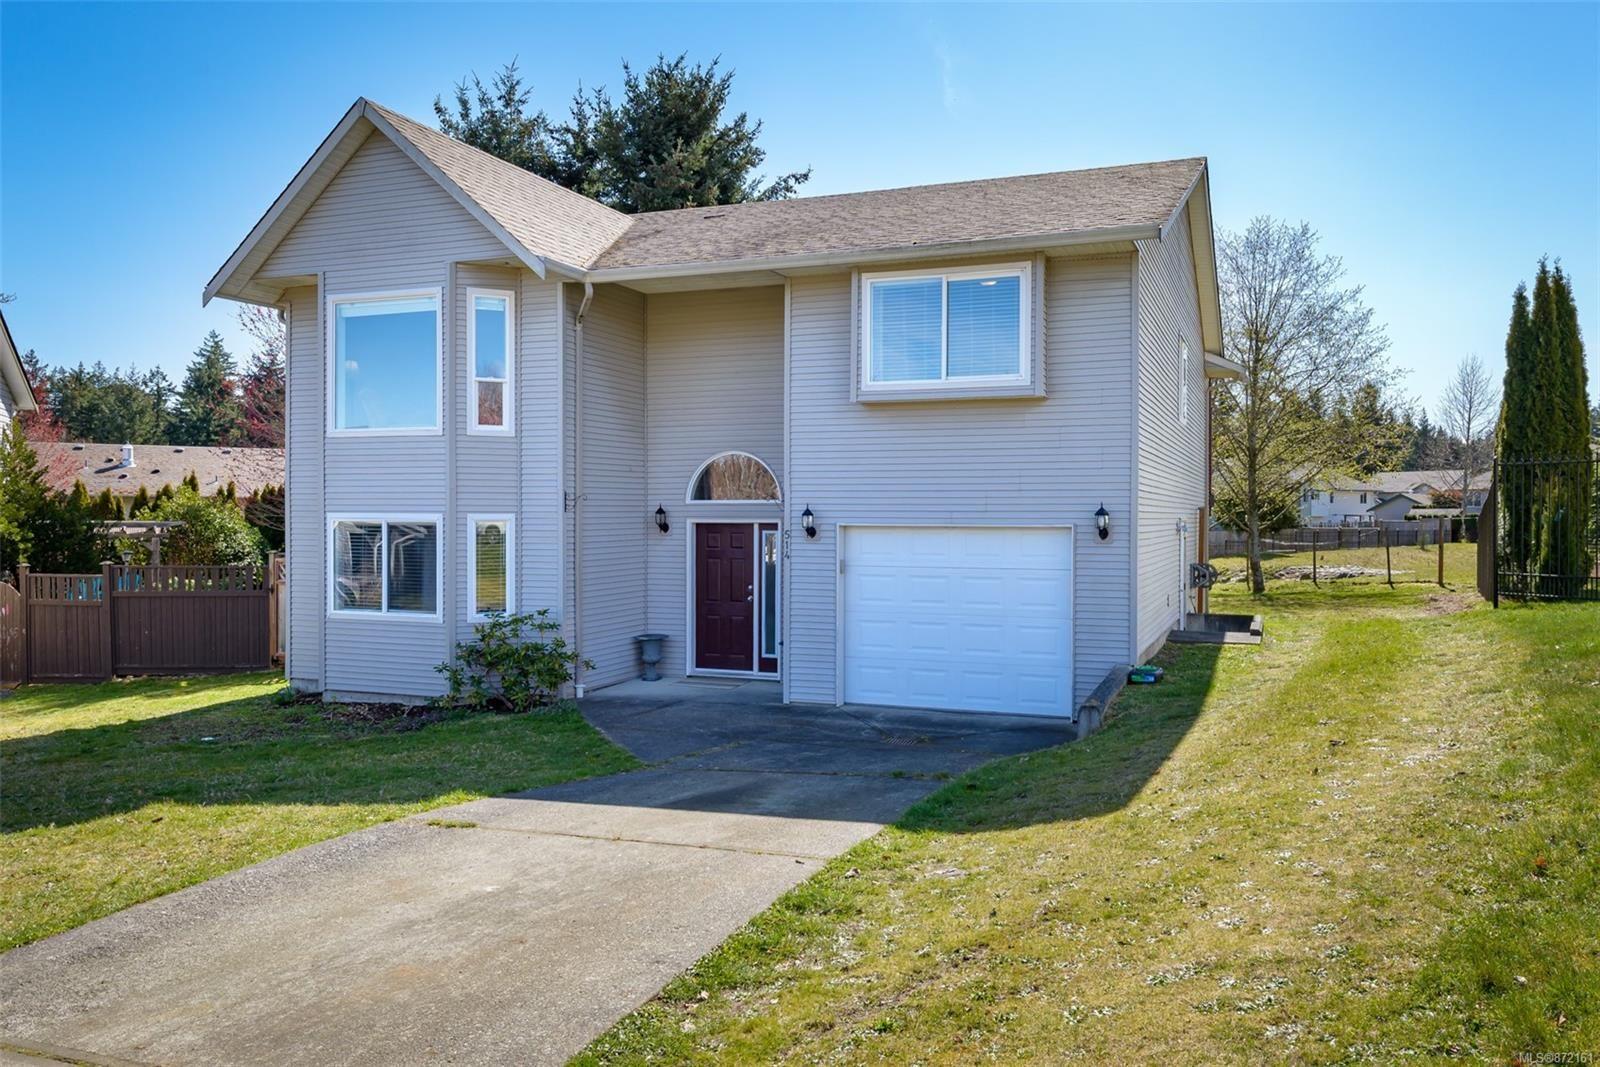 Main Photo: 514 Deerwood Pl in : CV Comox (Town of) House for sale (Comox Valley)  : MLS®# 872161